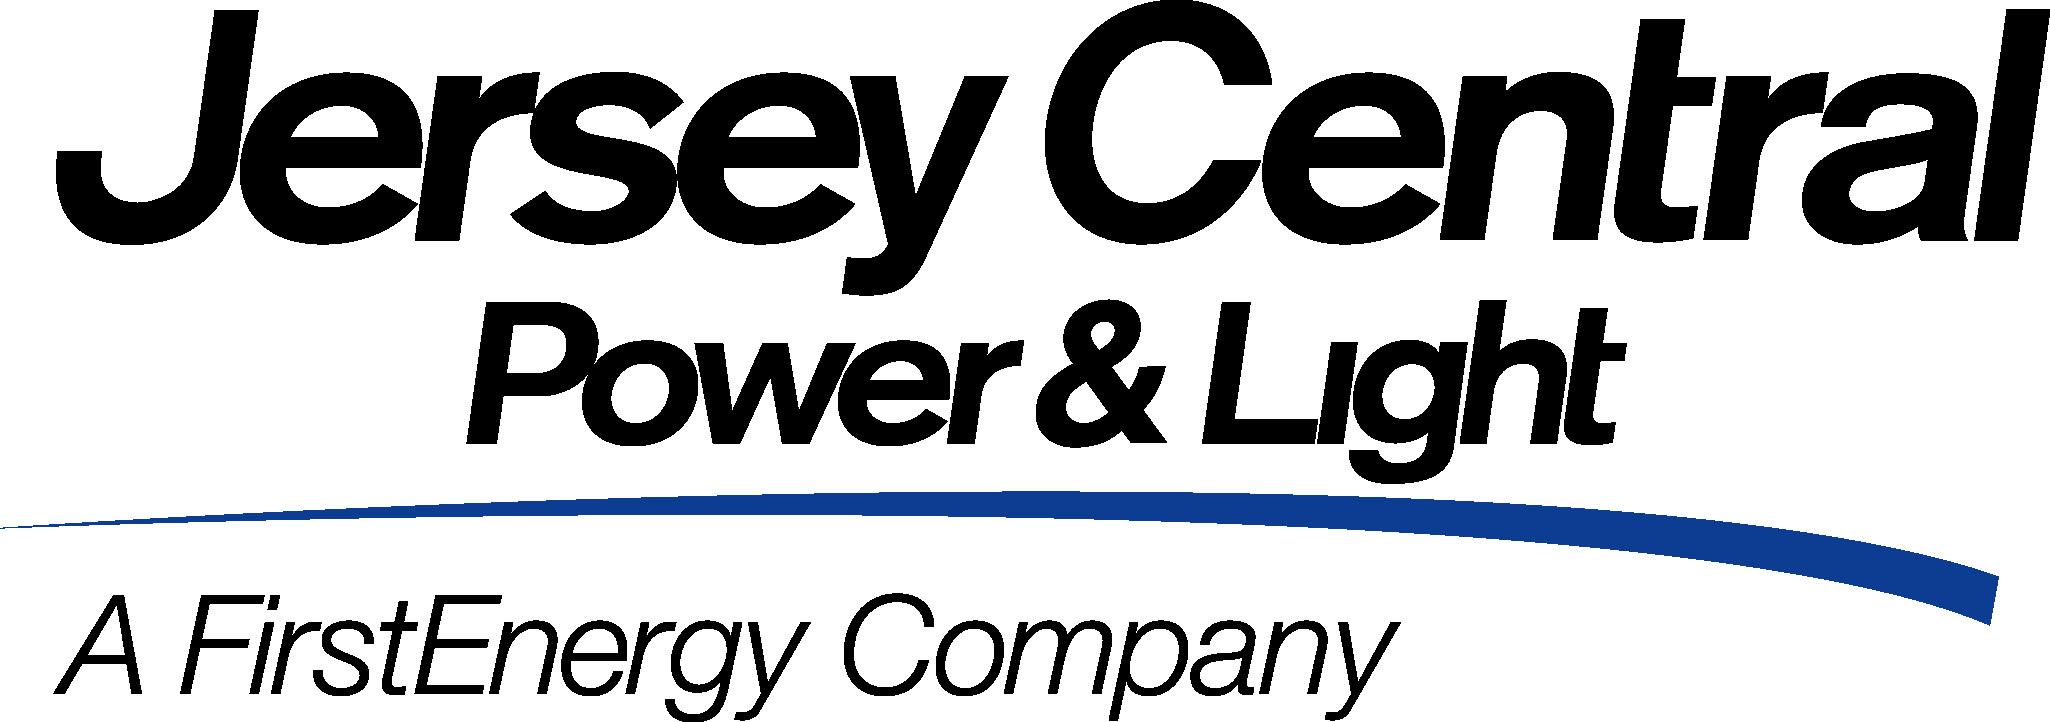 Jersey Central Power Light